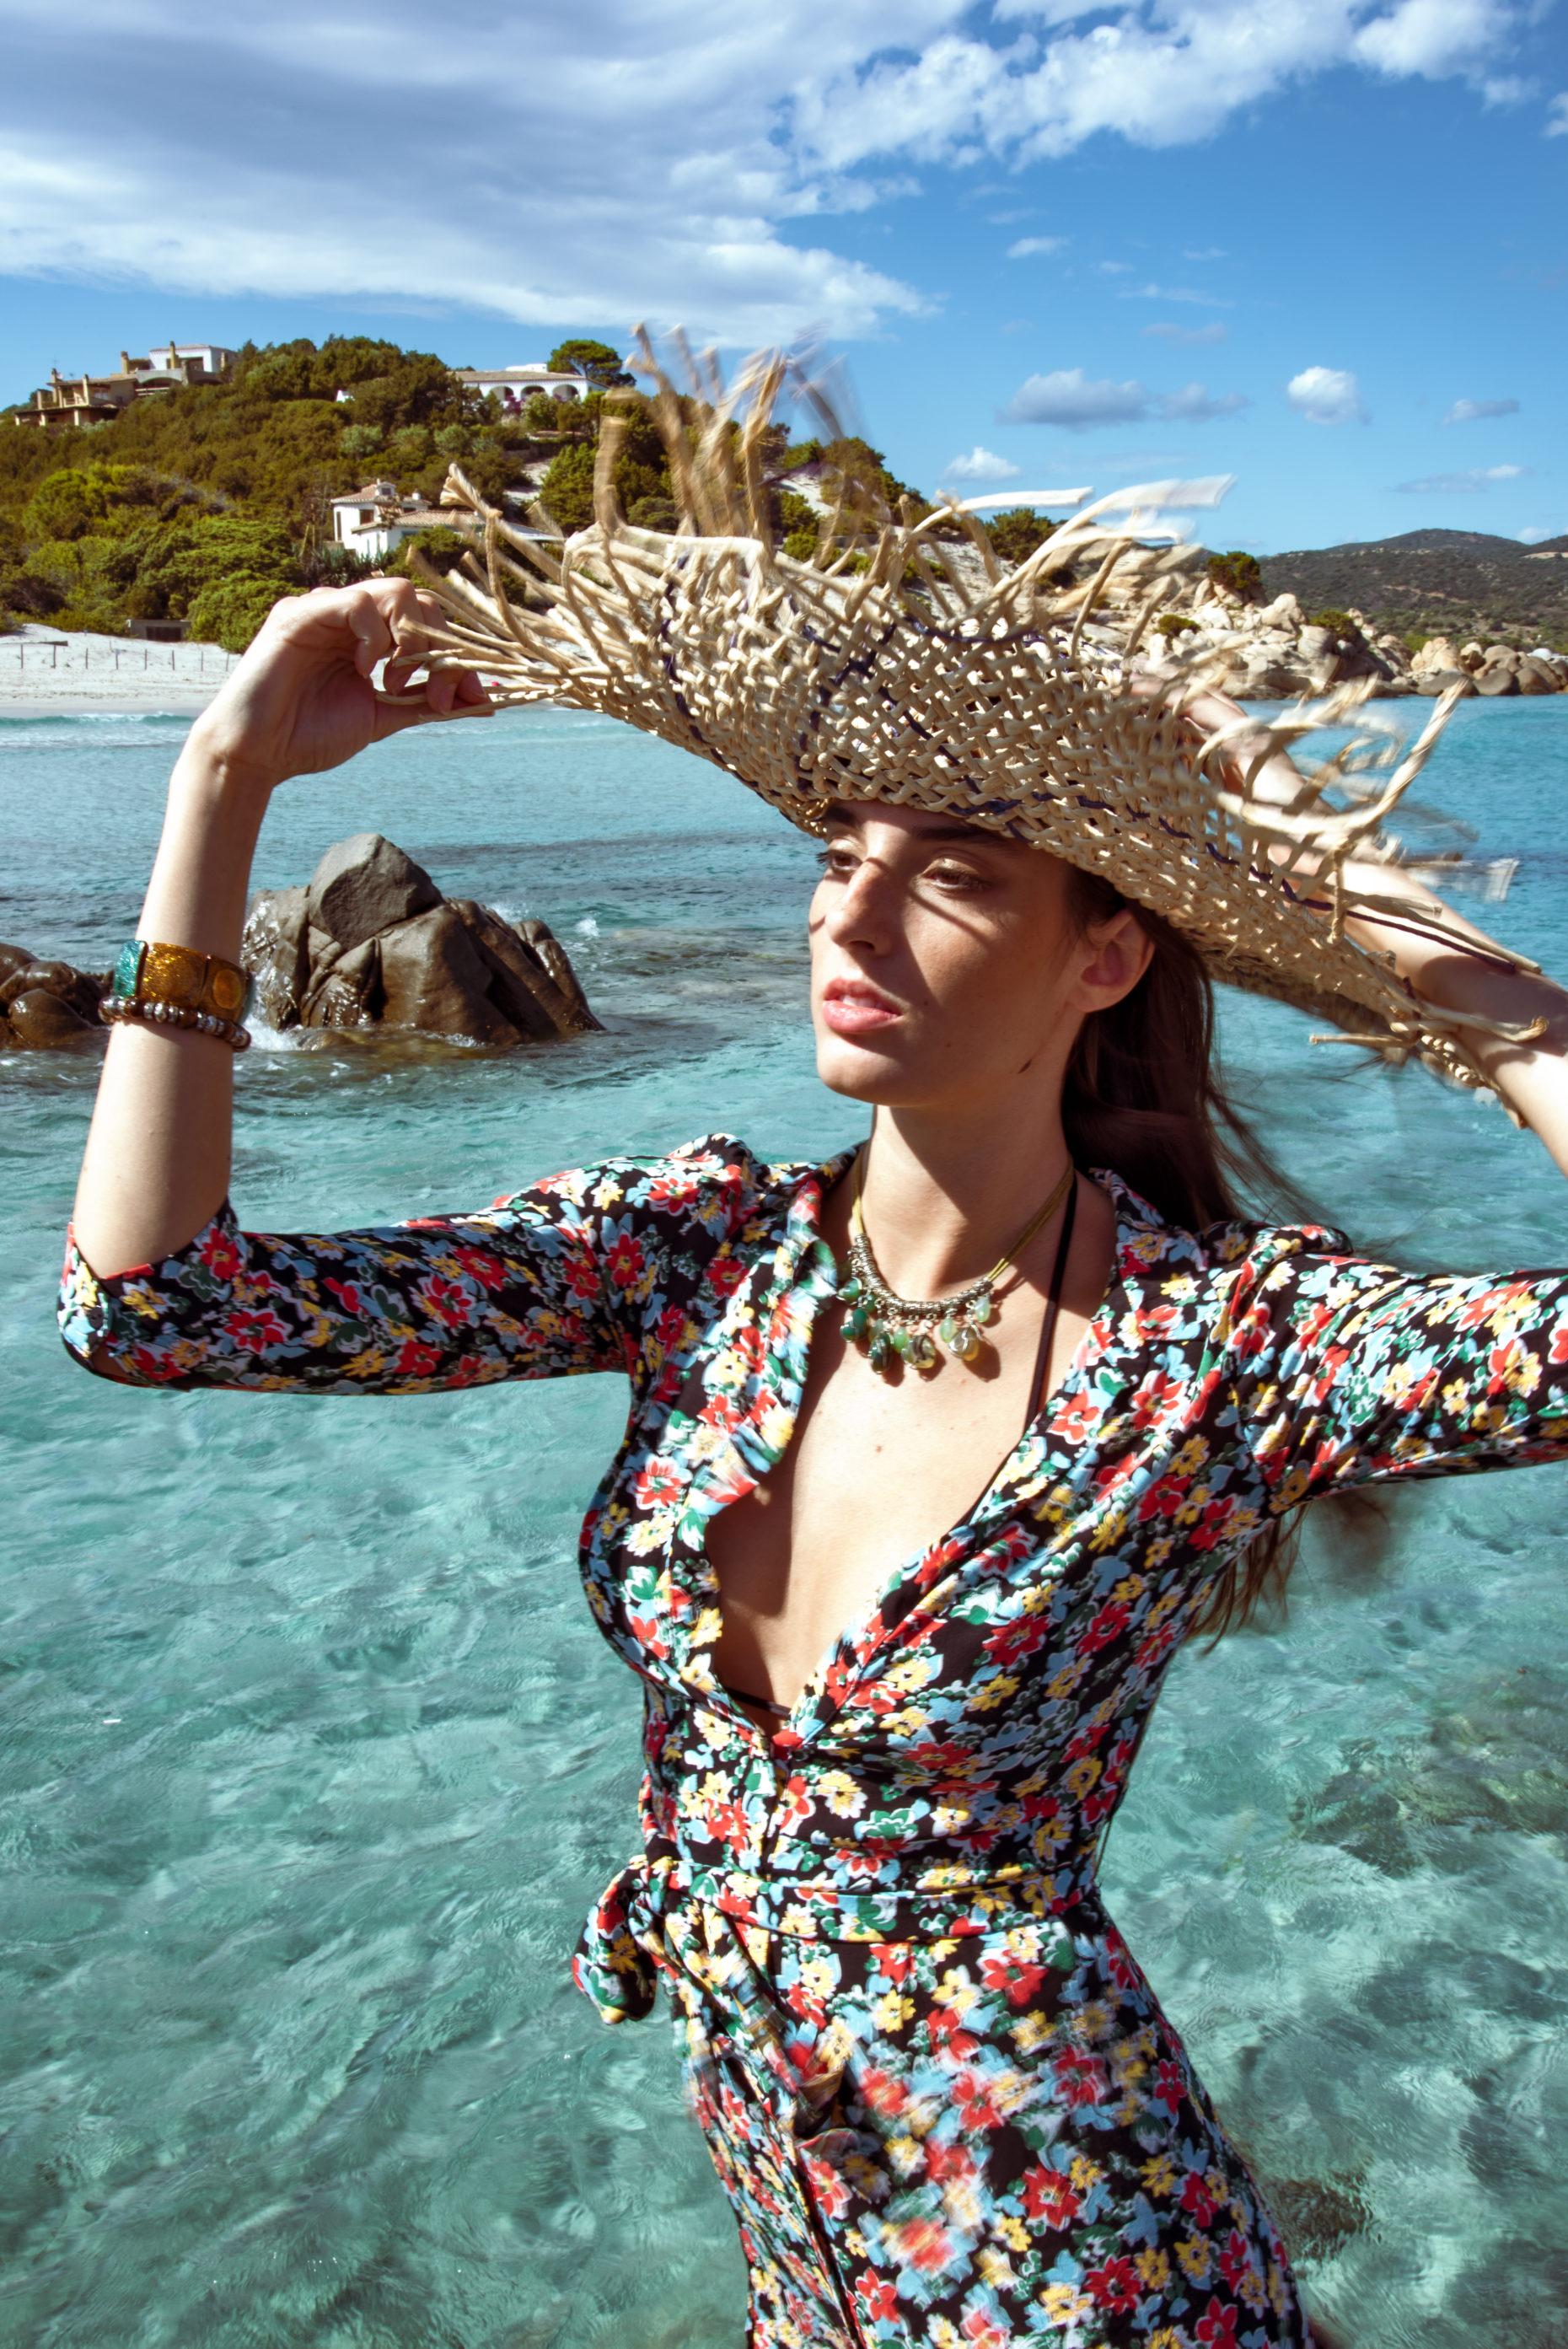 Janas Production - Enrico Olla Fashion Photography